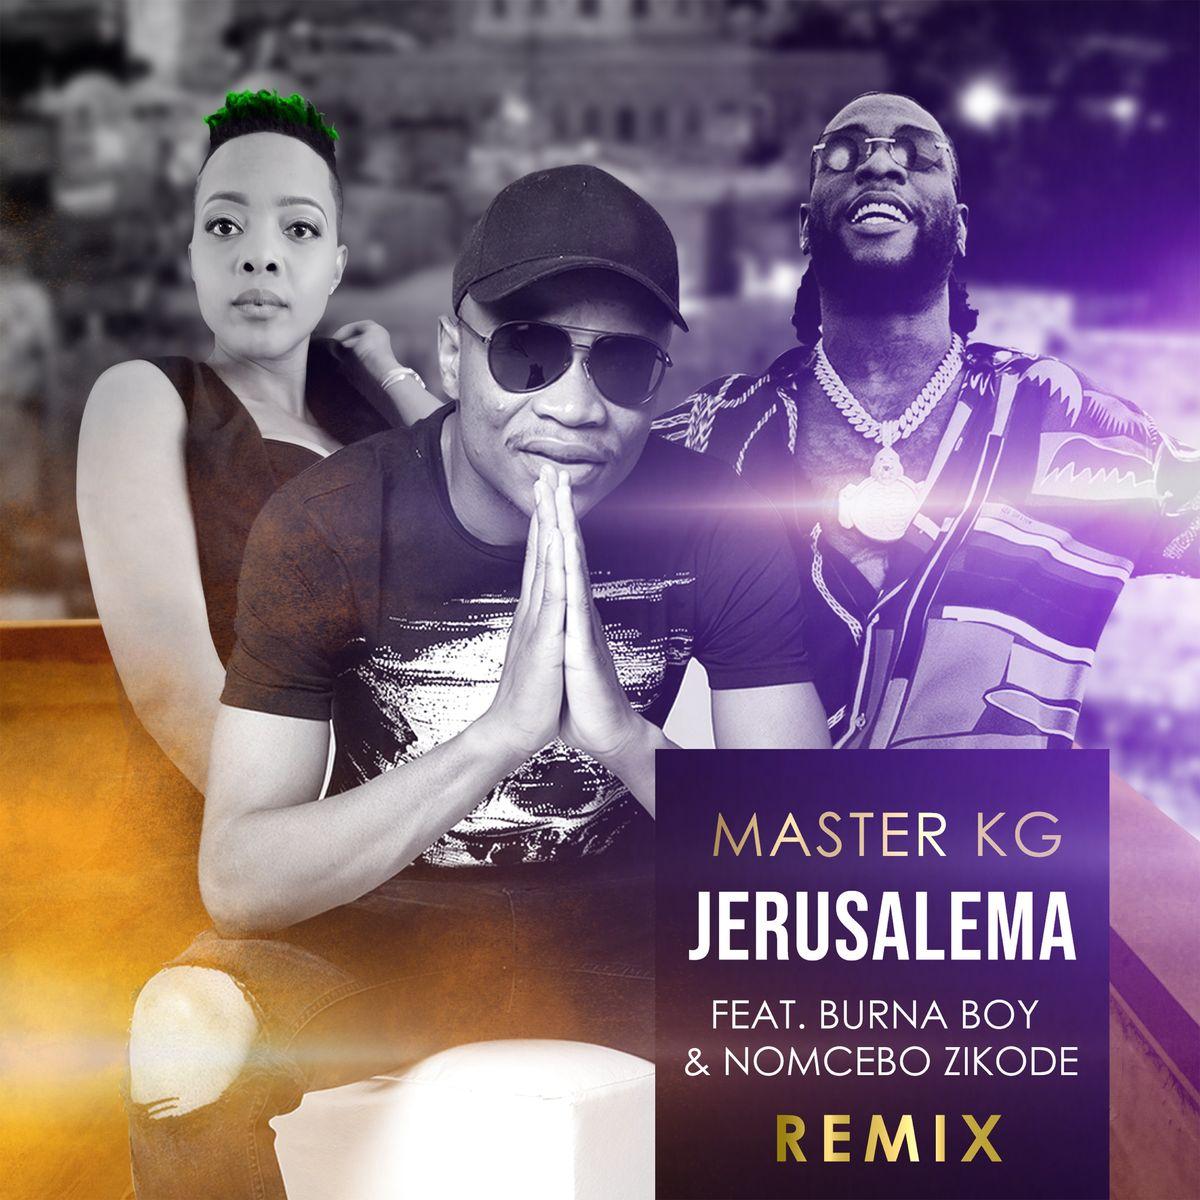 ultratop.be - Master KG feat. Burna Boy & Nomcebo Zikode ...